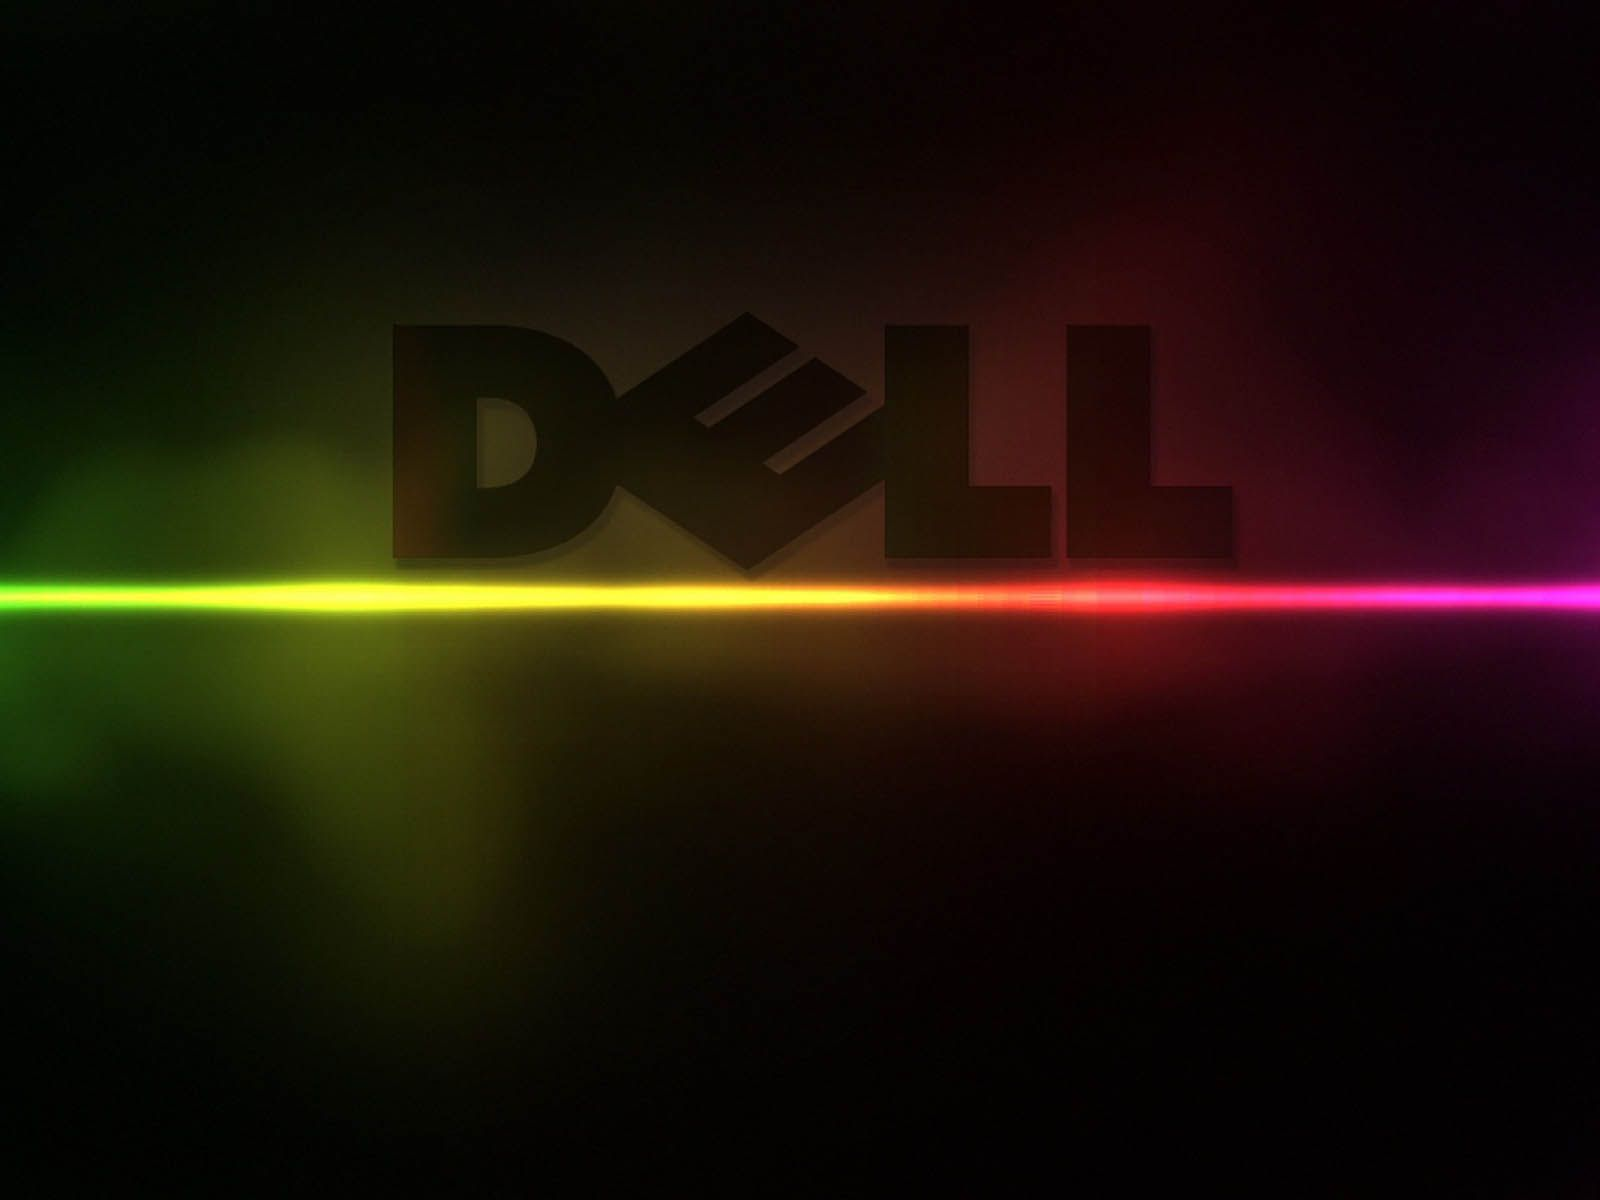 Dell Desktop Backgrounds Wallpaper 16001200 Desktop Backgrounds 1600x1200